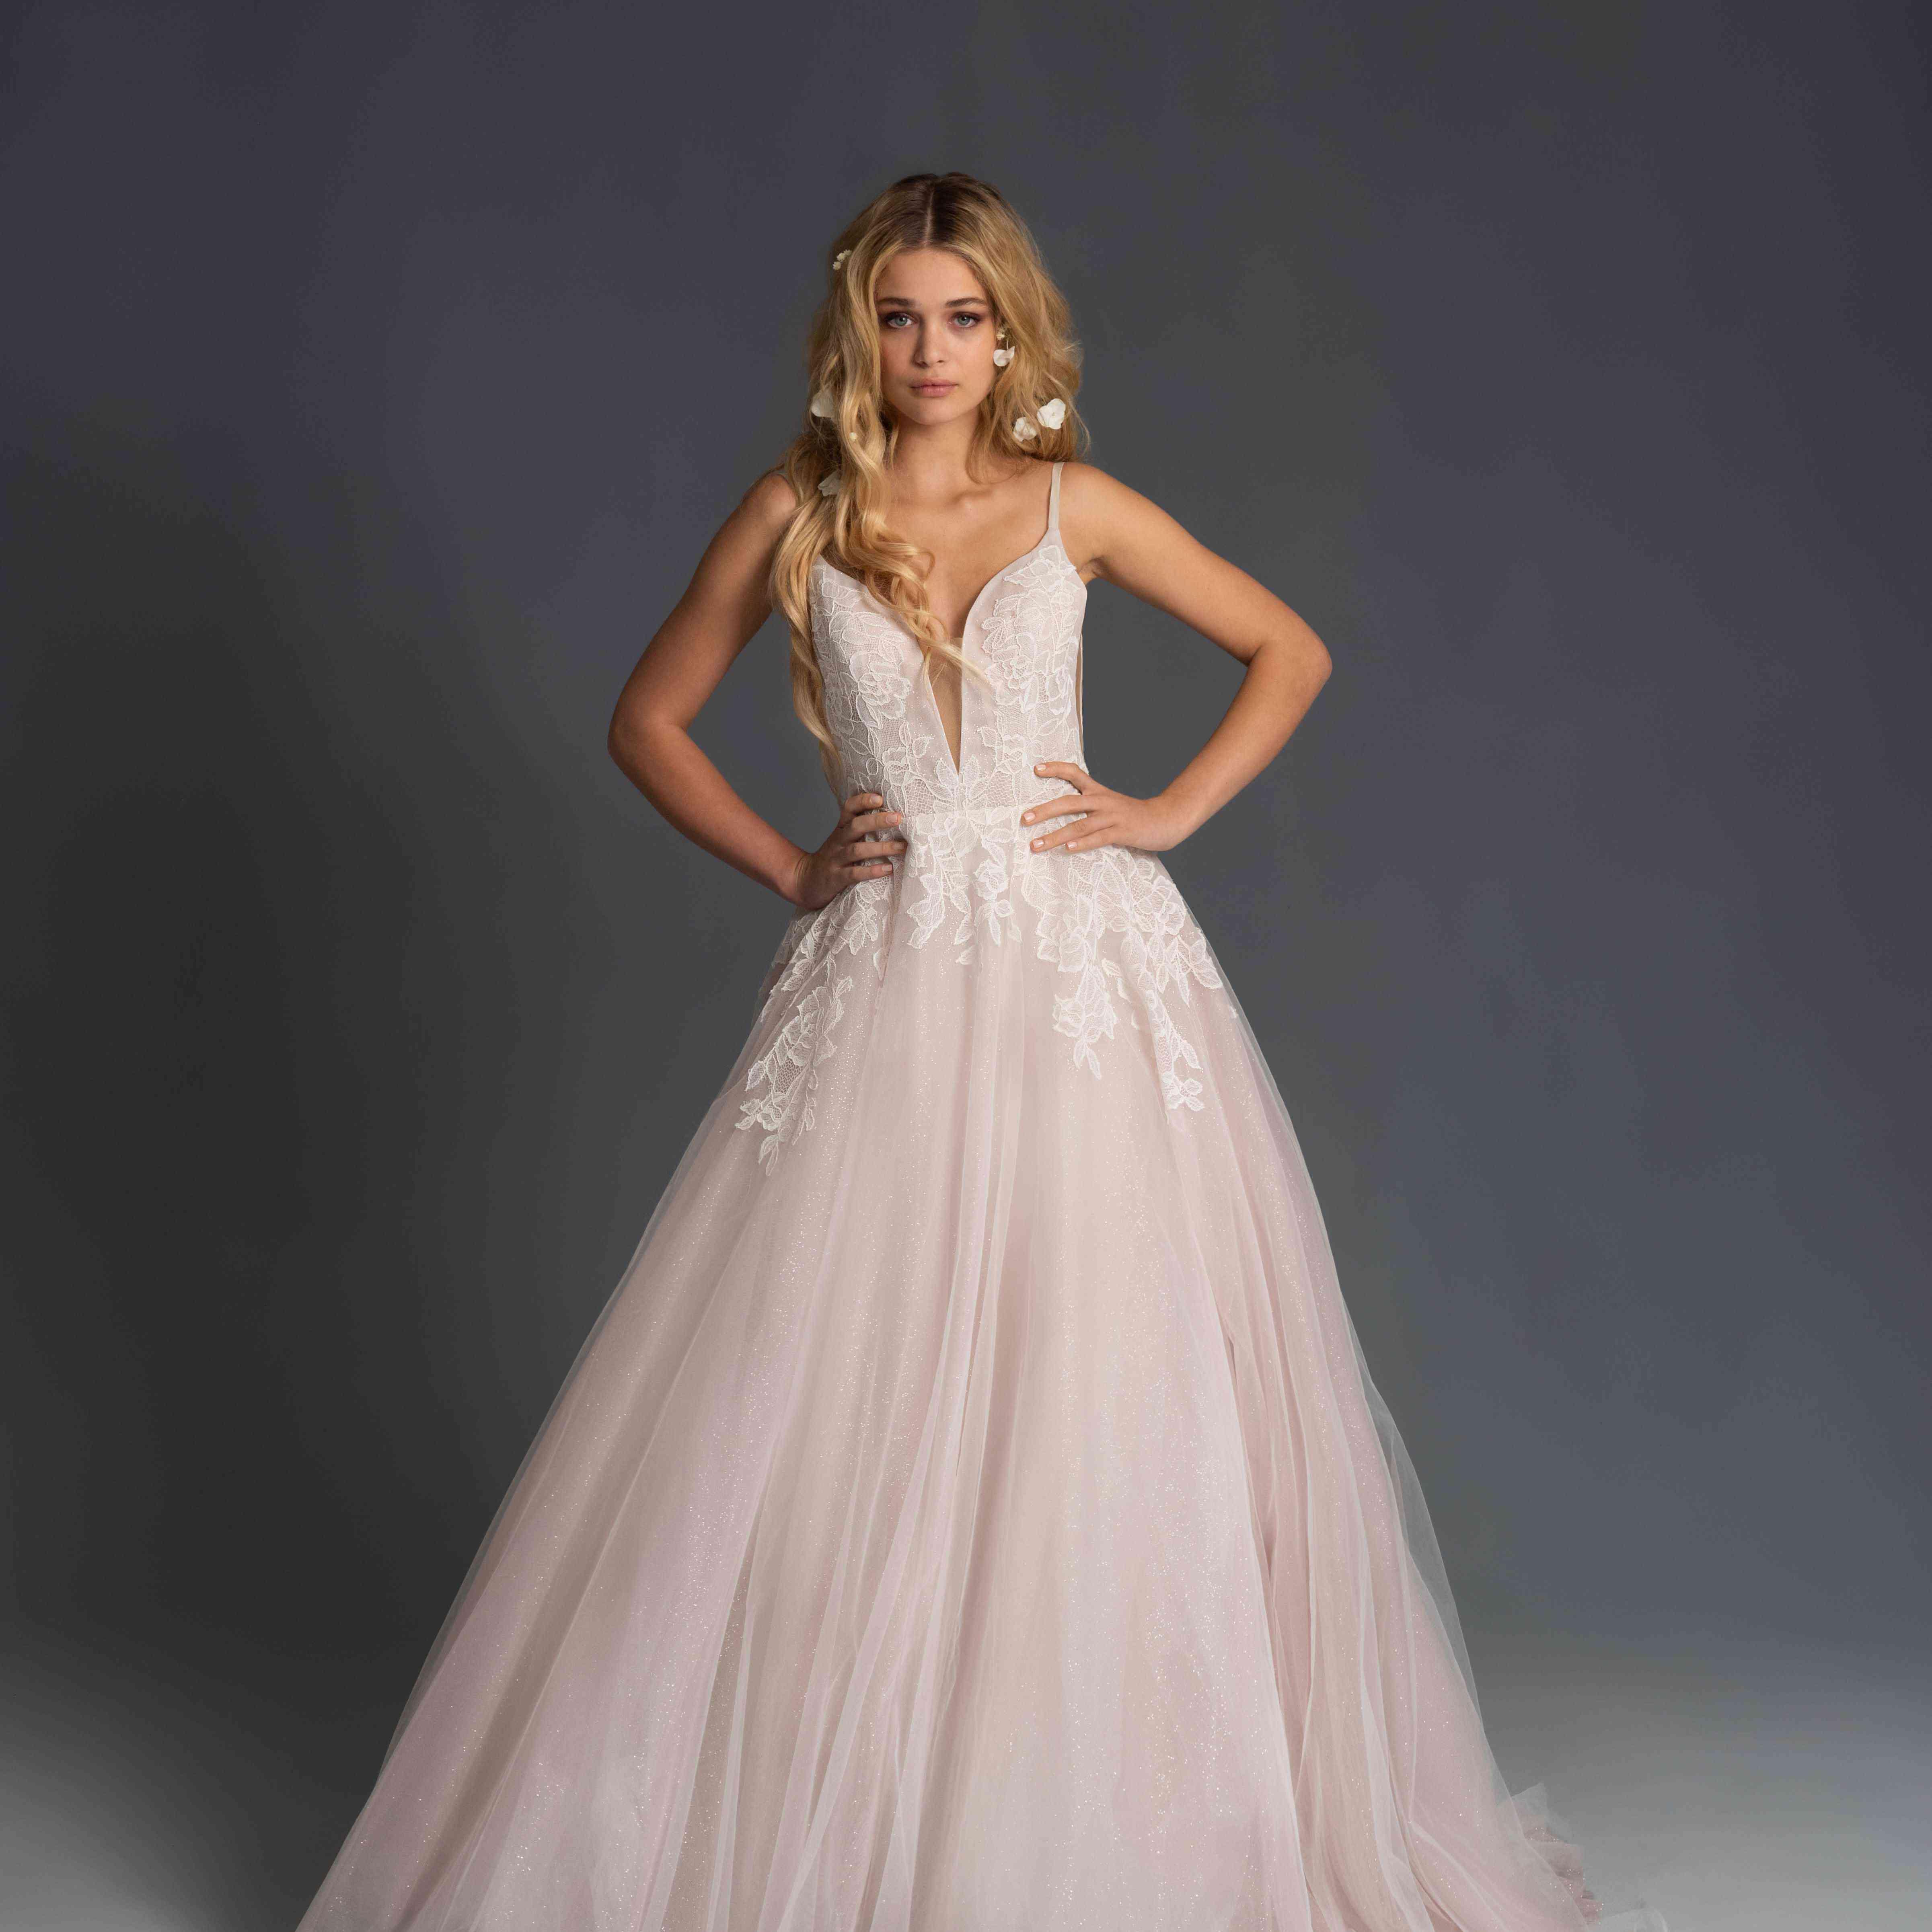 Model in blush sleeveless wedding dress